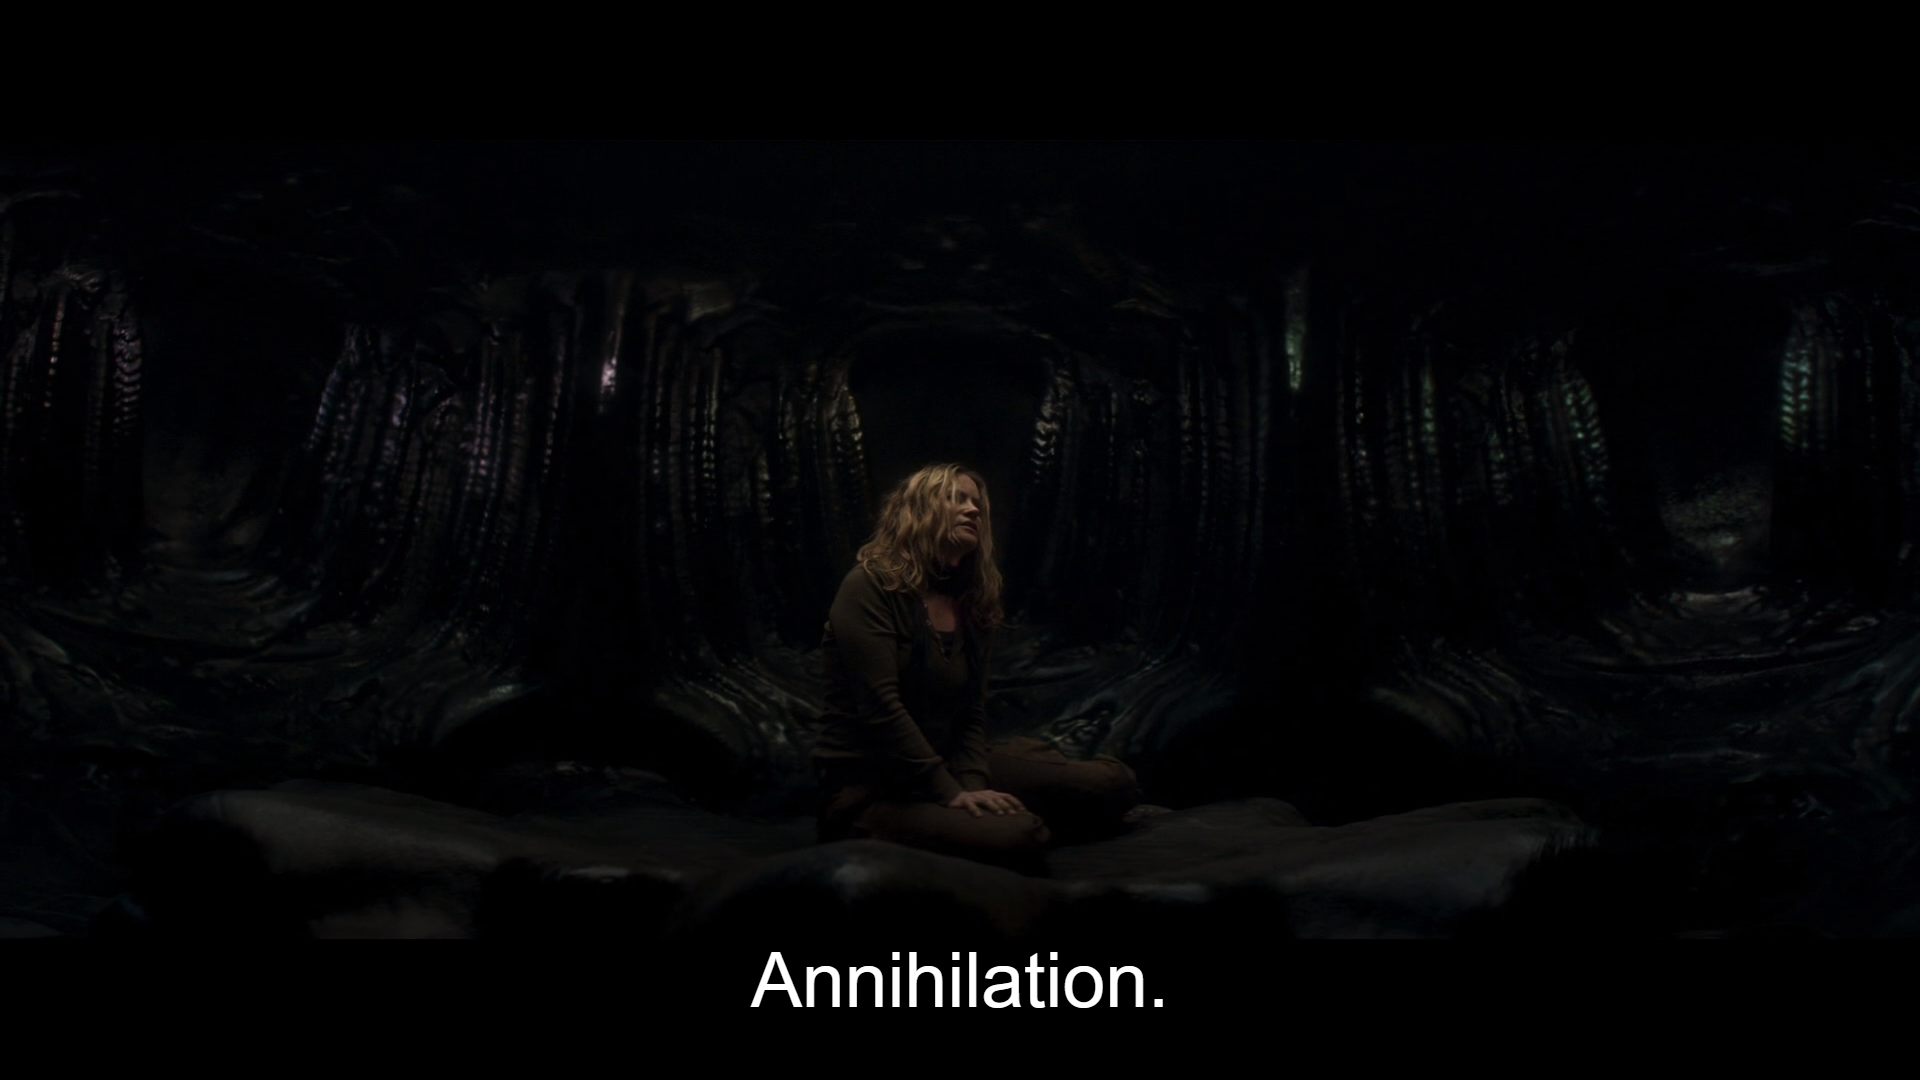 Annihilation_63.png